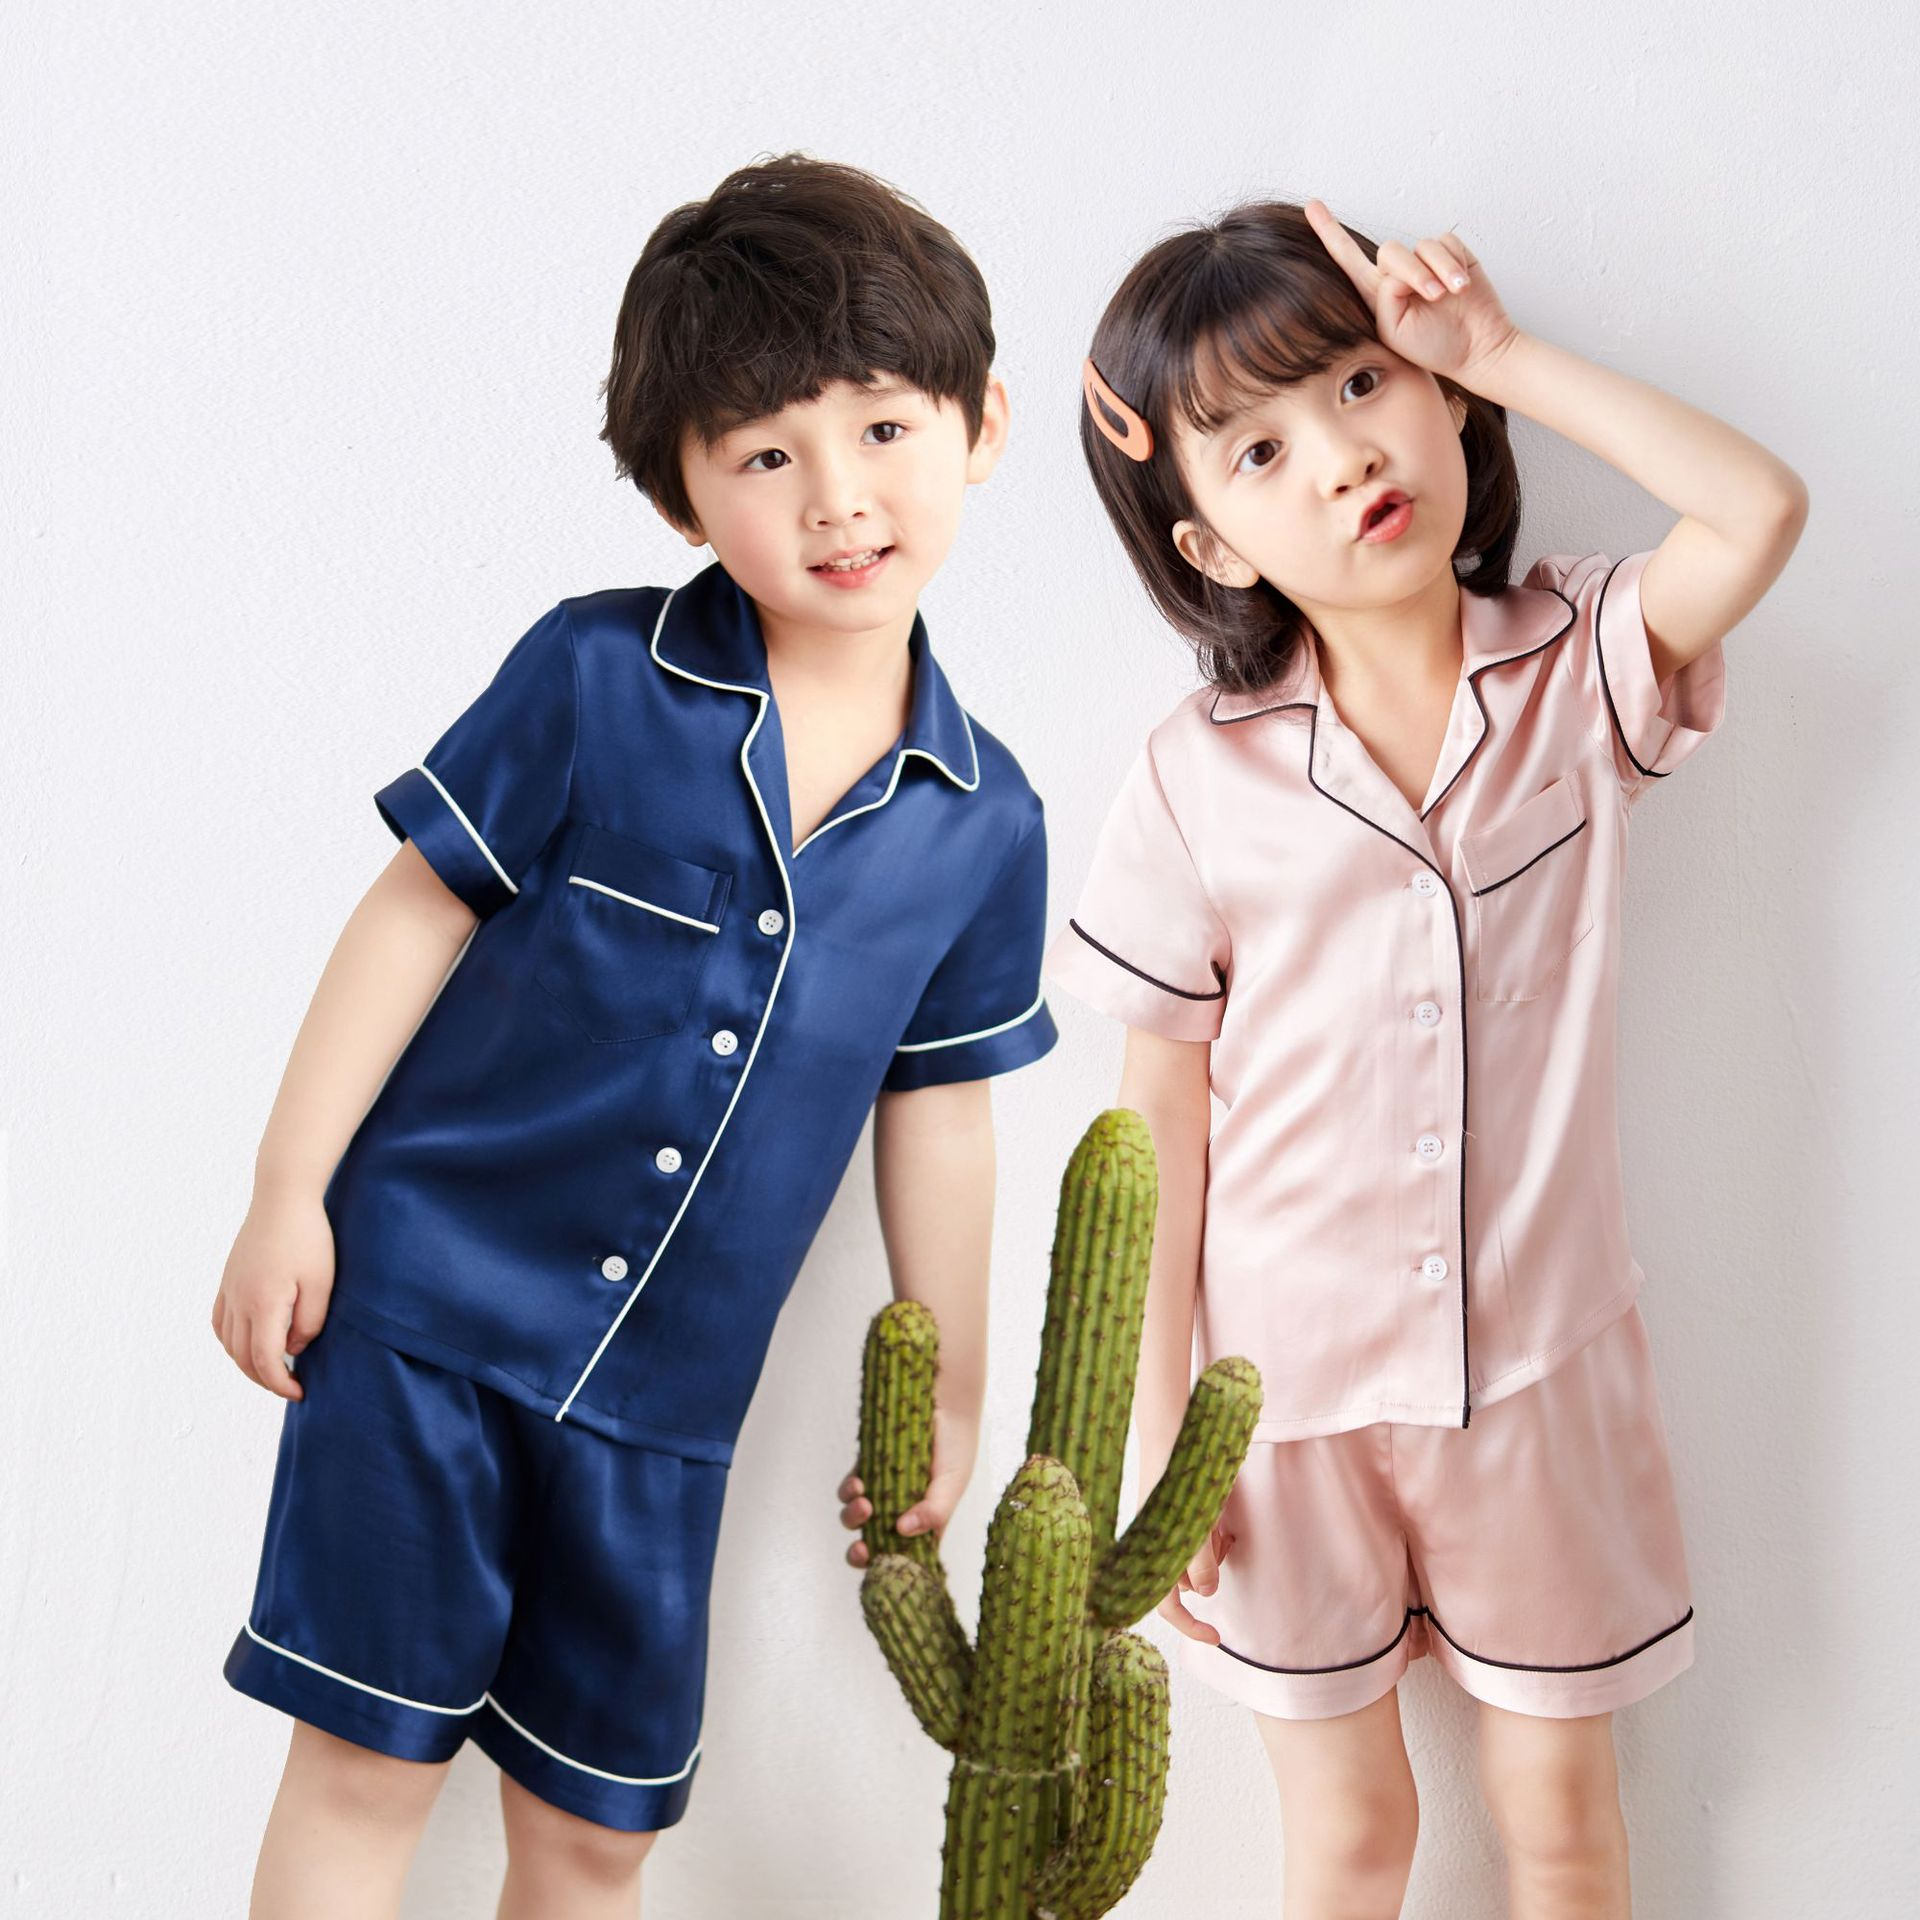 0c04154c7 مصادر شركات تصنيع بيجامة مجموعات الاطفال وبيجامة مجموعات الاطفال في  Alibaba.com